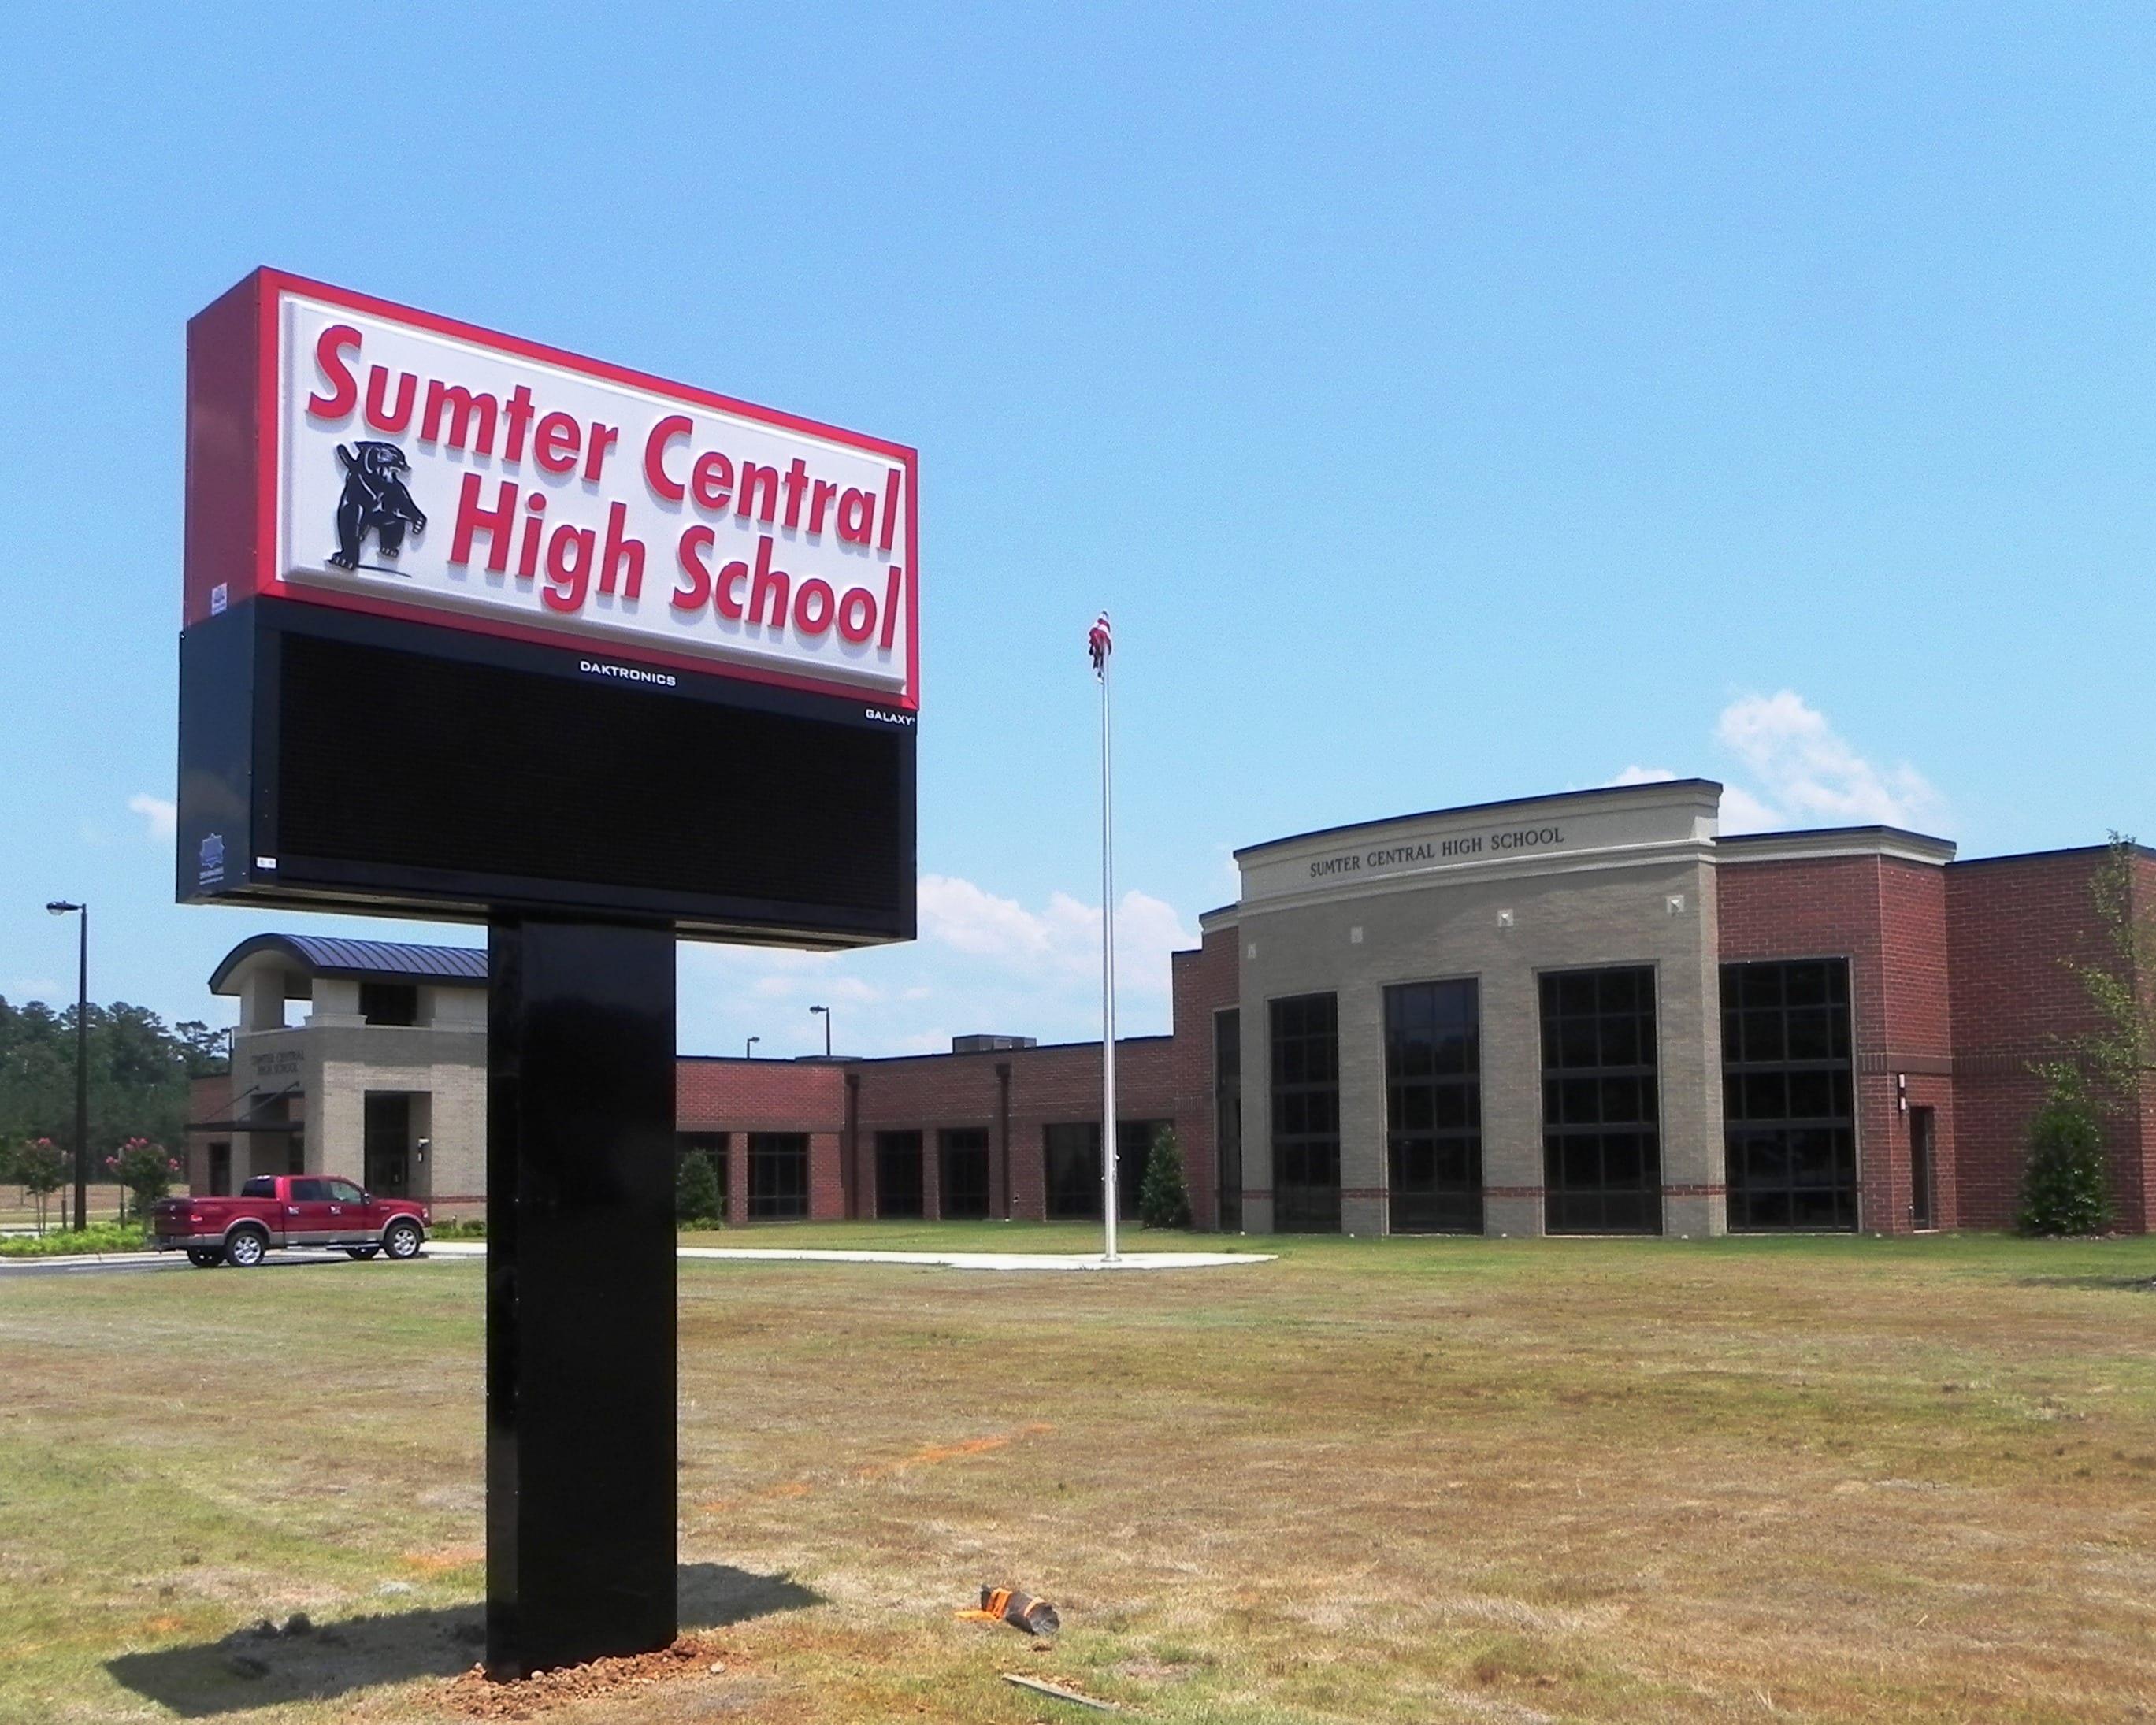 County School High Sumter